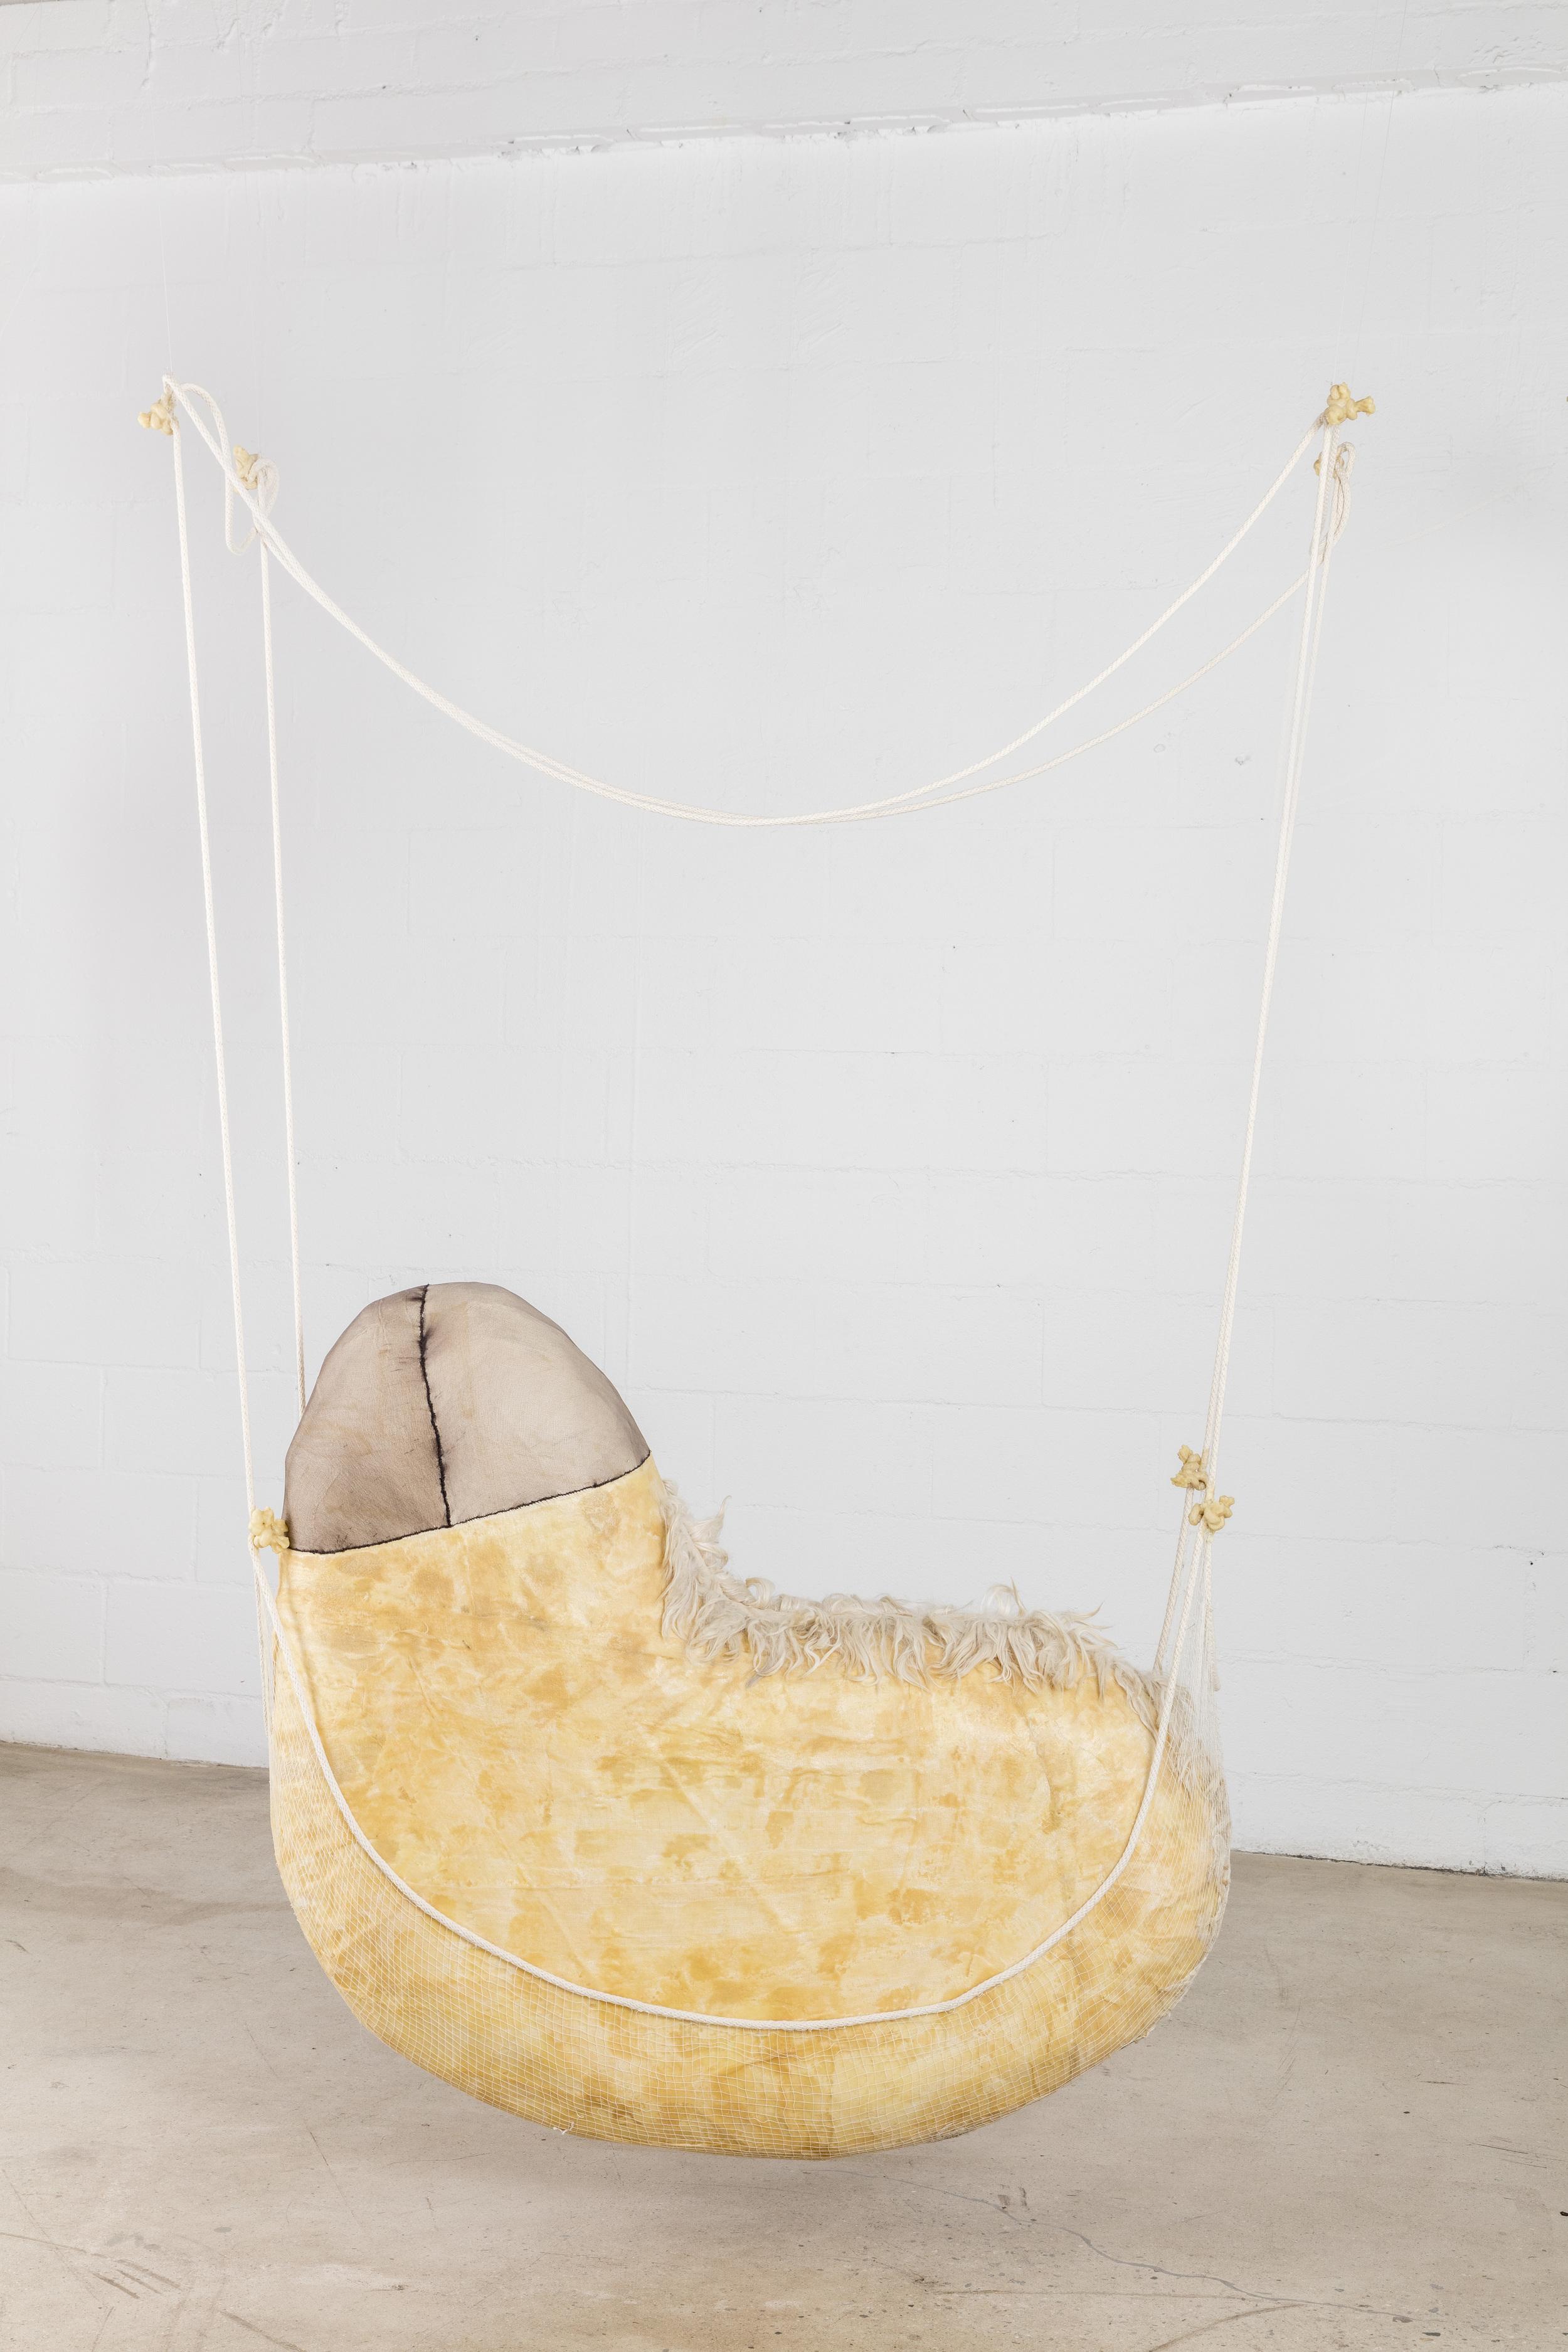 Tanya Aguiniga   Beasts of Burden , 2016  Cotton rope, cotton thread, foam, gauze, alpaca, nylon and beeswax  74 x 52 x 13 inches